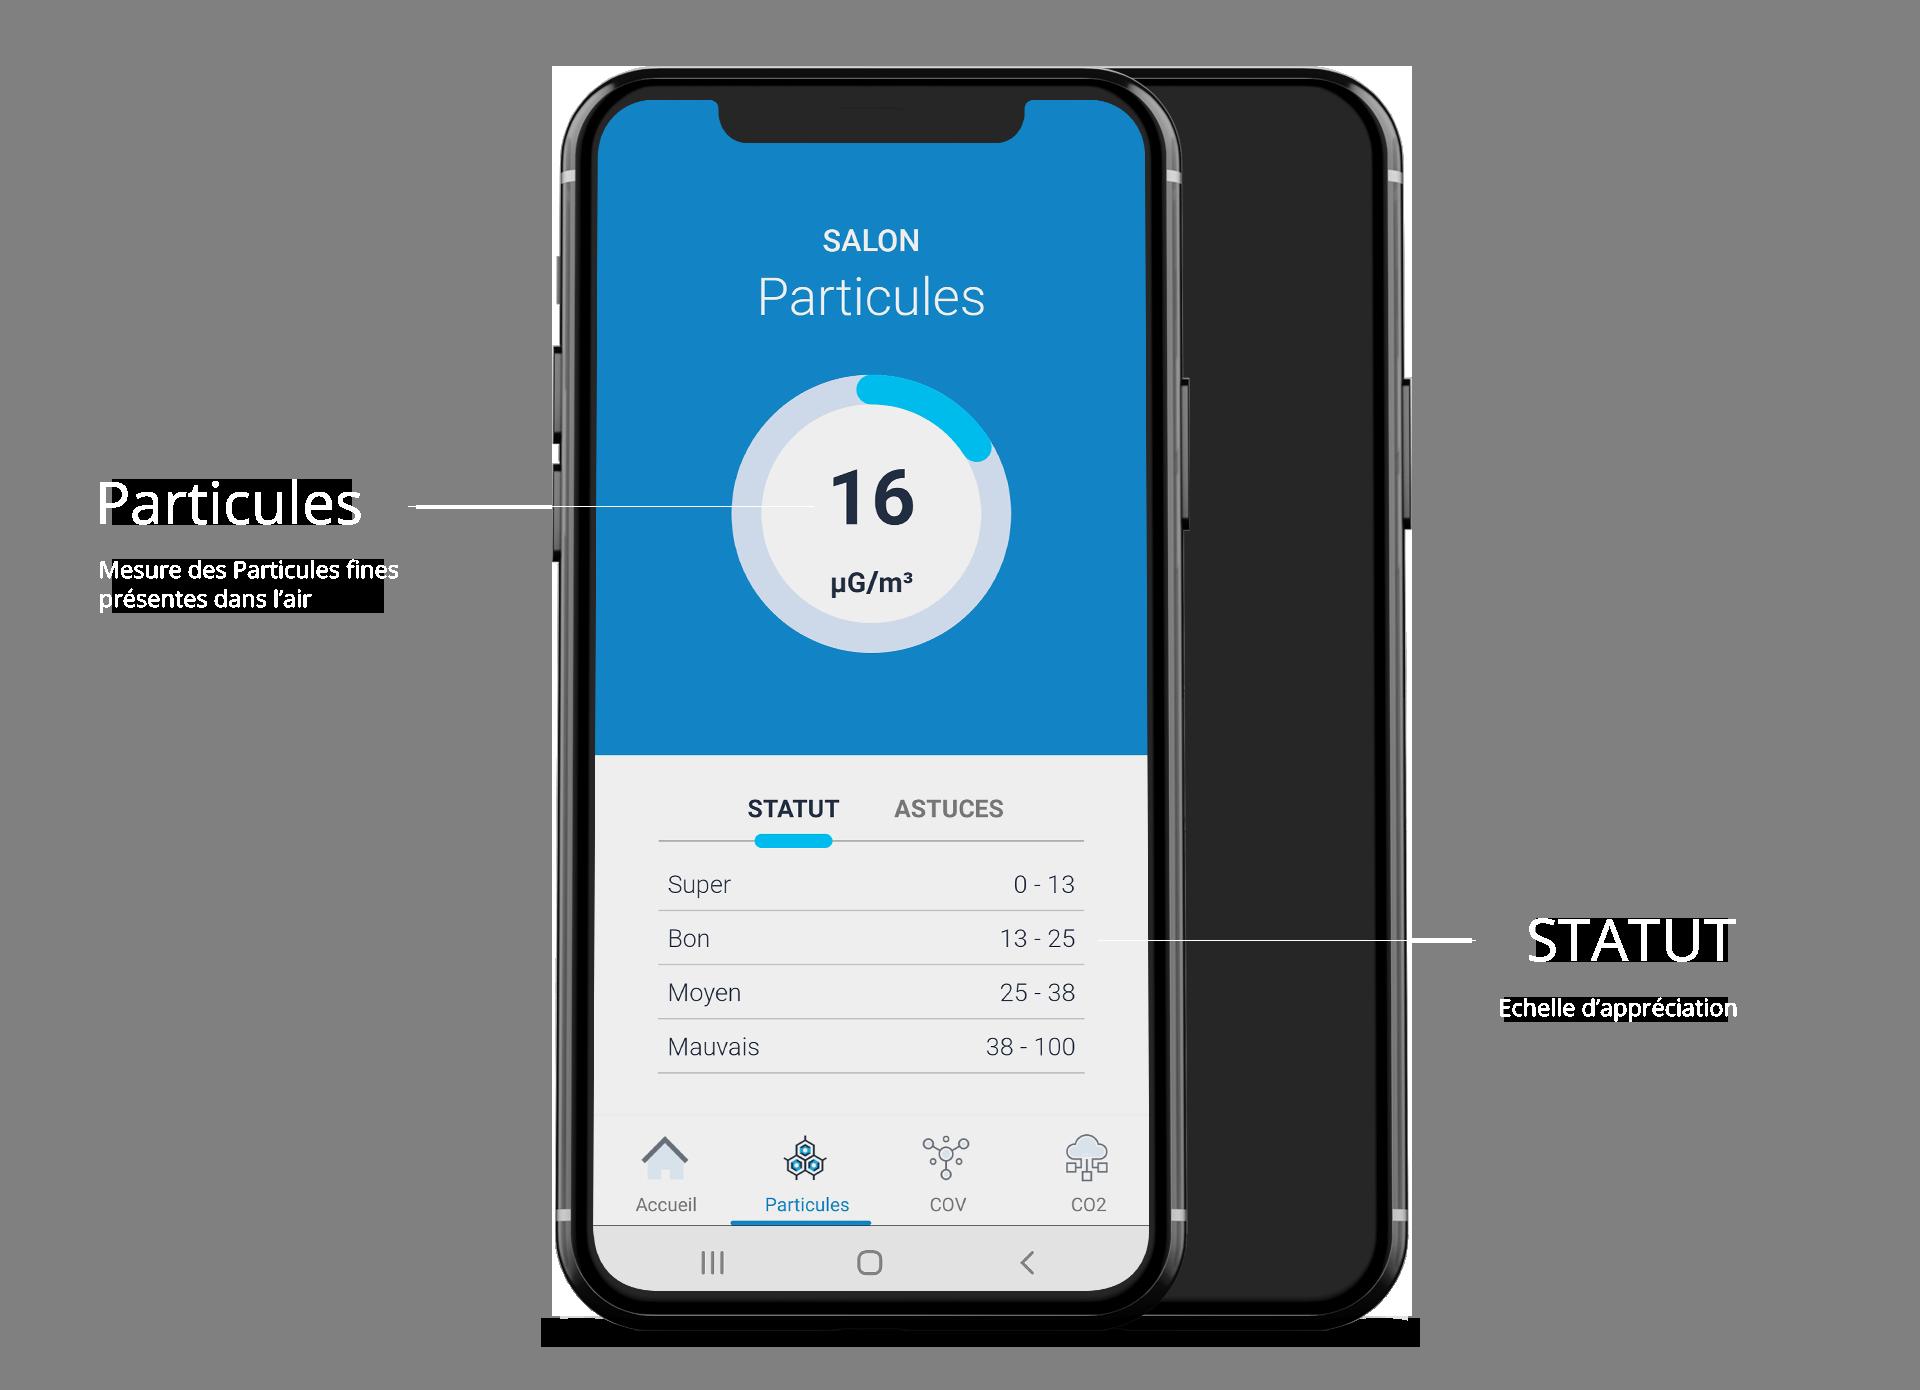 Particules Fines (PM1 PM2.5 PM10)